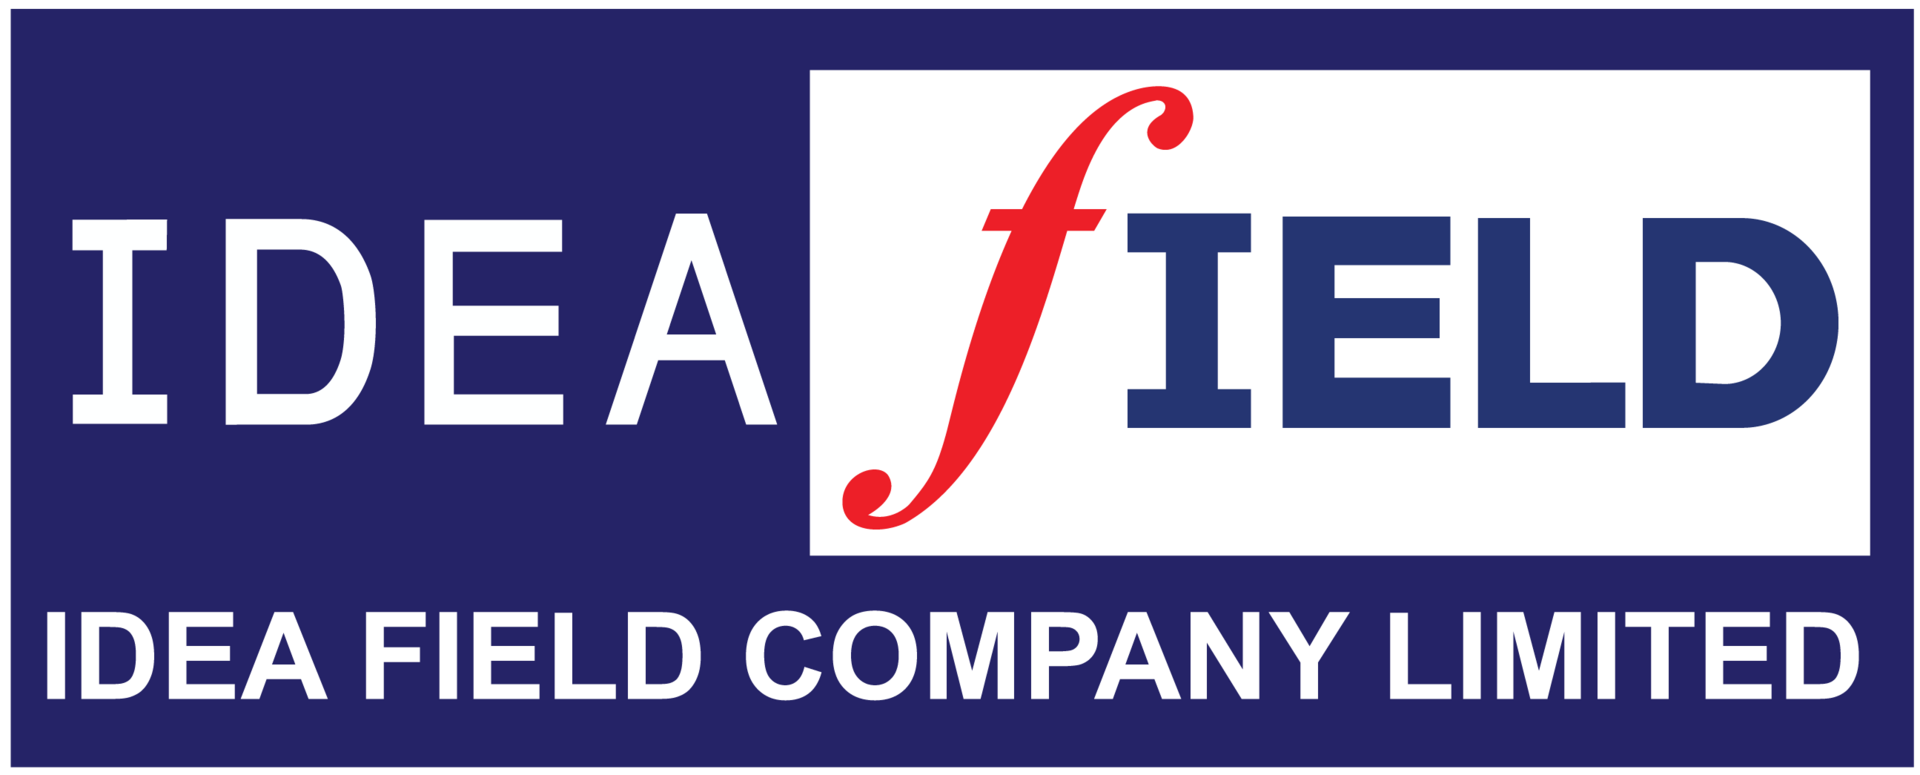 aw-Logo-Idea-Field-single-A4-blue-red-1--465156156